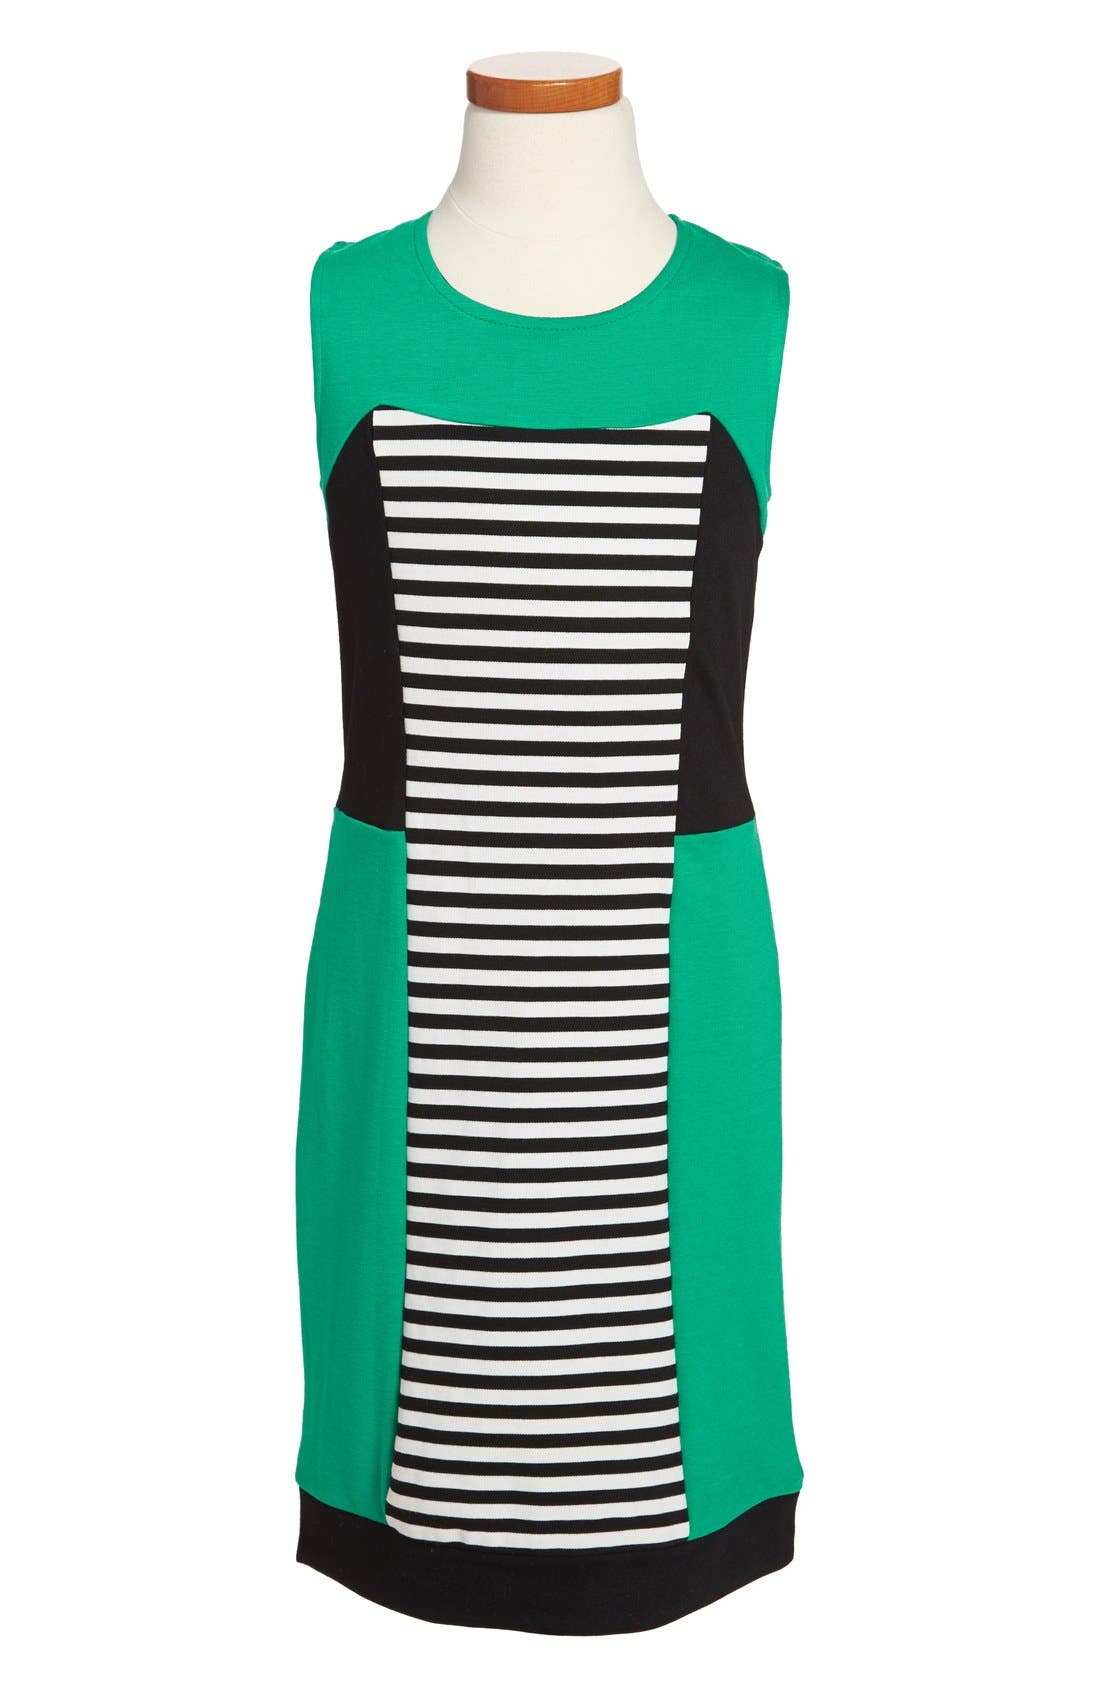 Alternate Image 1 Selected - Nicole Miller Stripe Colorblock Dress (Big Girls)